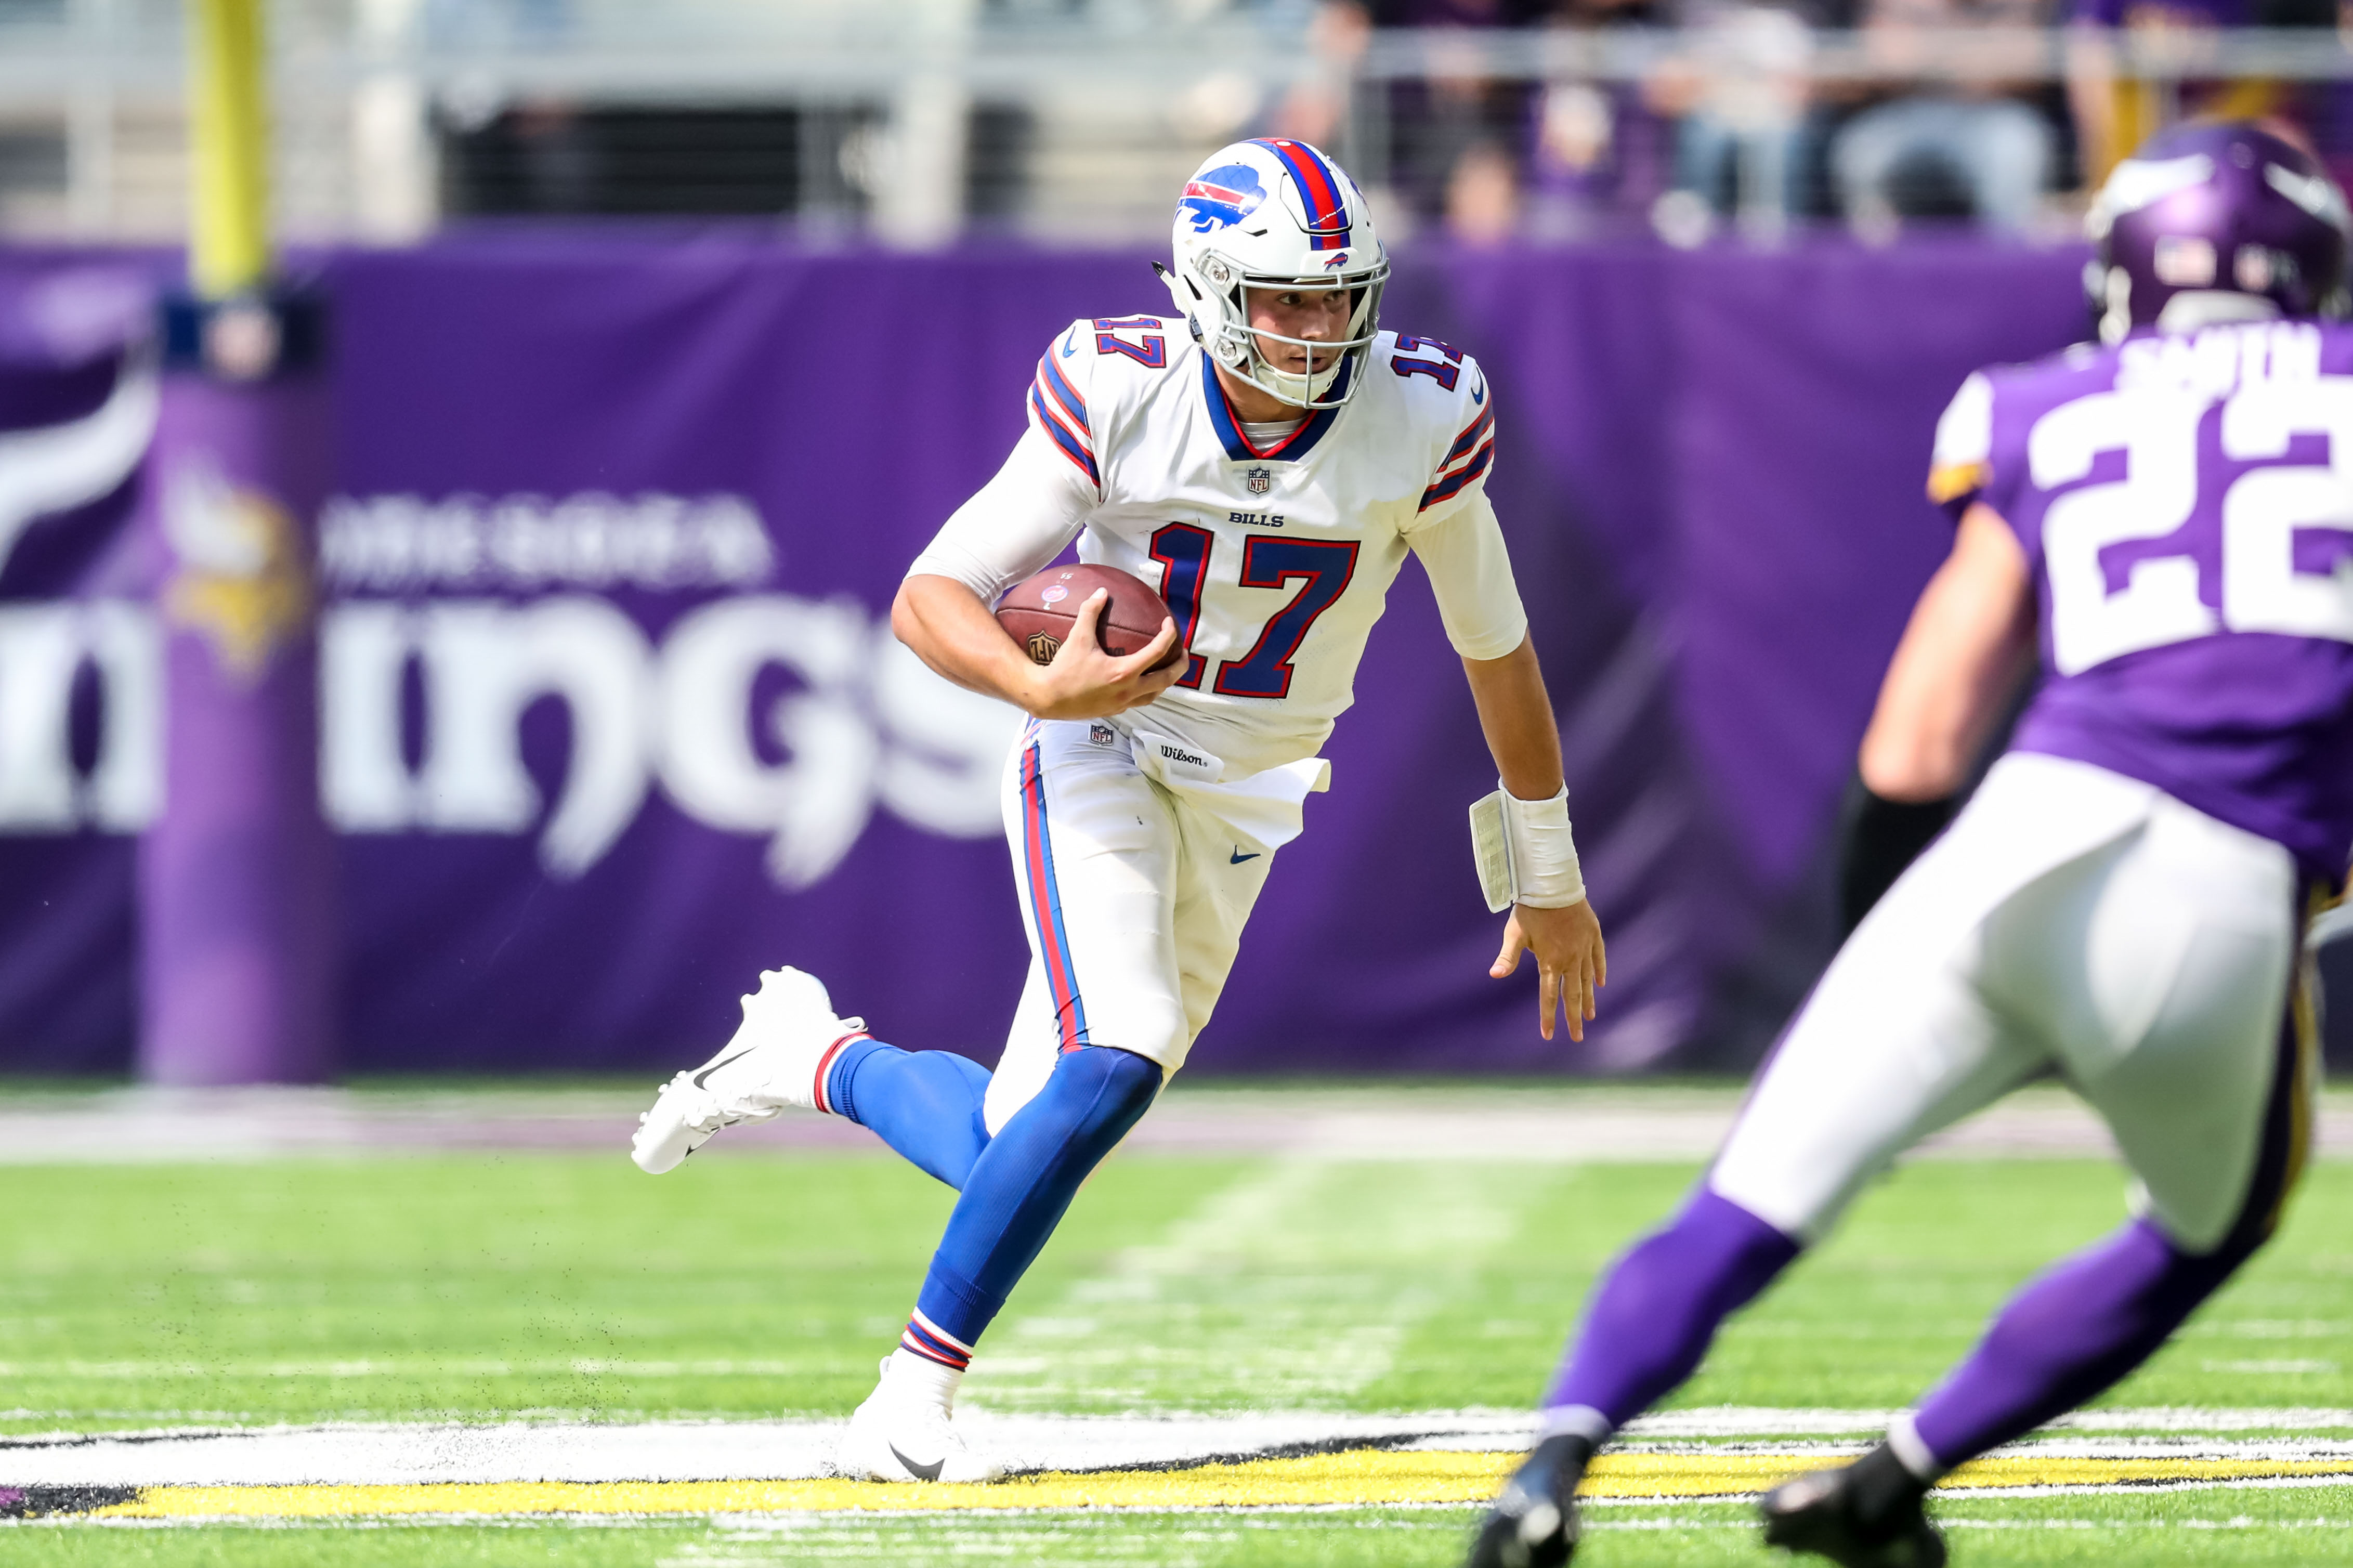 NFL: Buffalo Bills at Minnesota Vikings